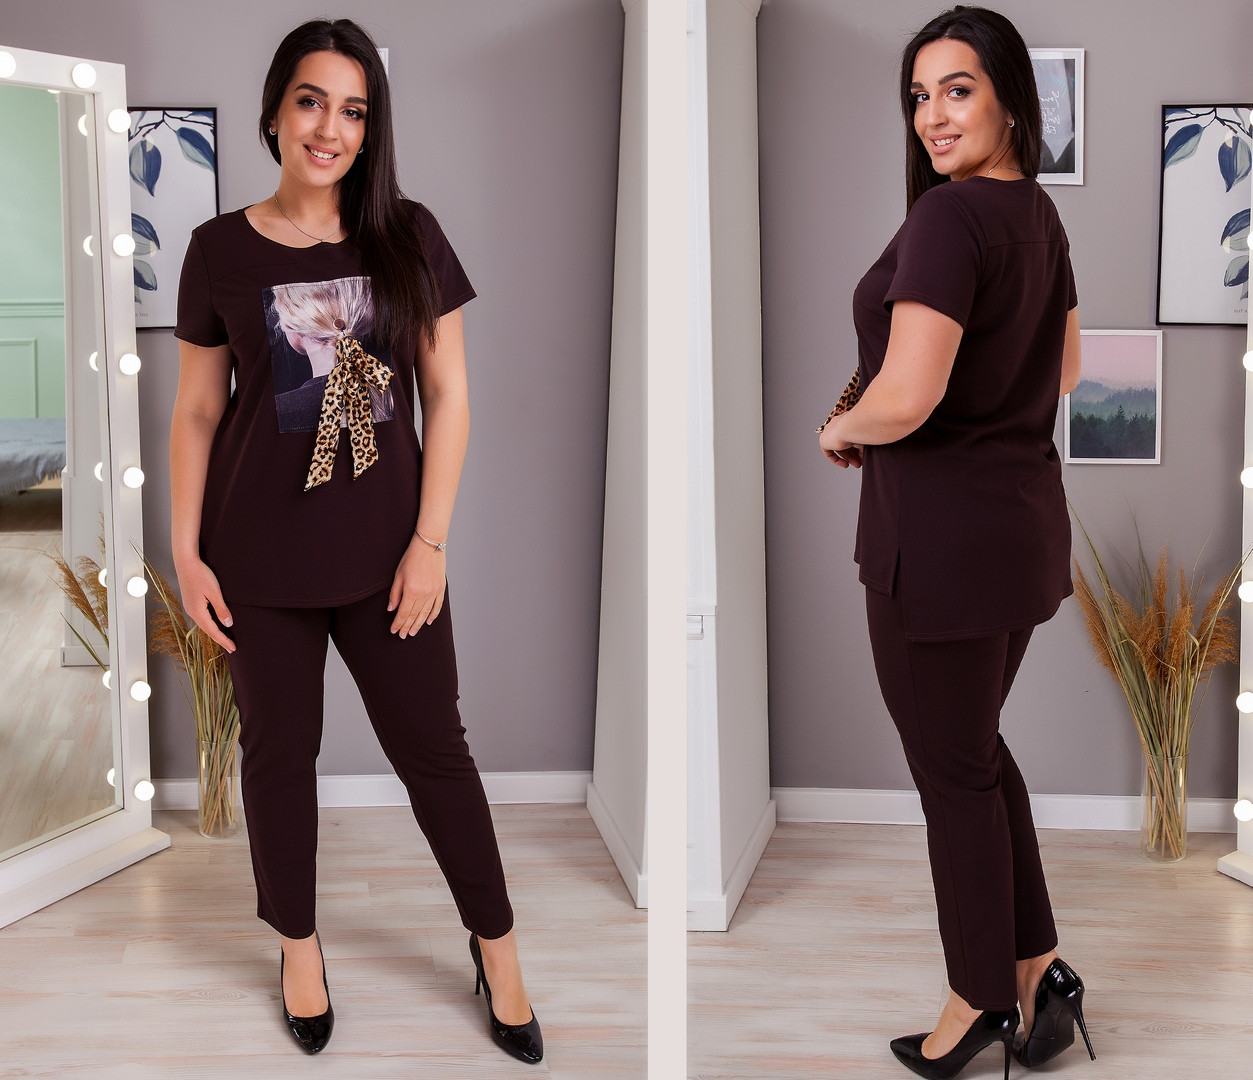 Женский костюм футболка и штаны креп дайвинг размеры: 50-52, 54-56, 58-60, 62-64